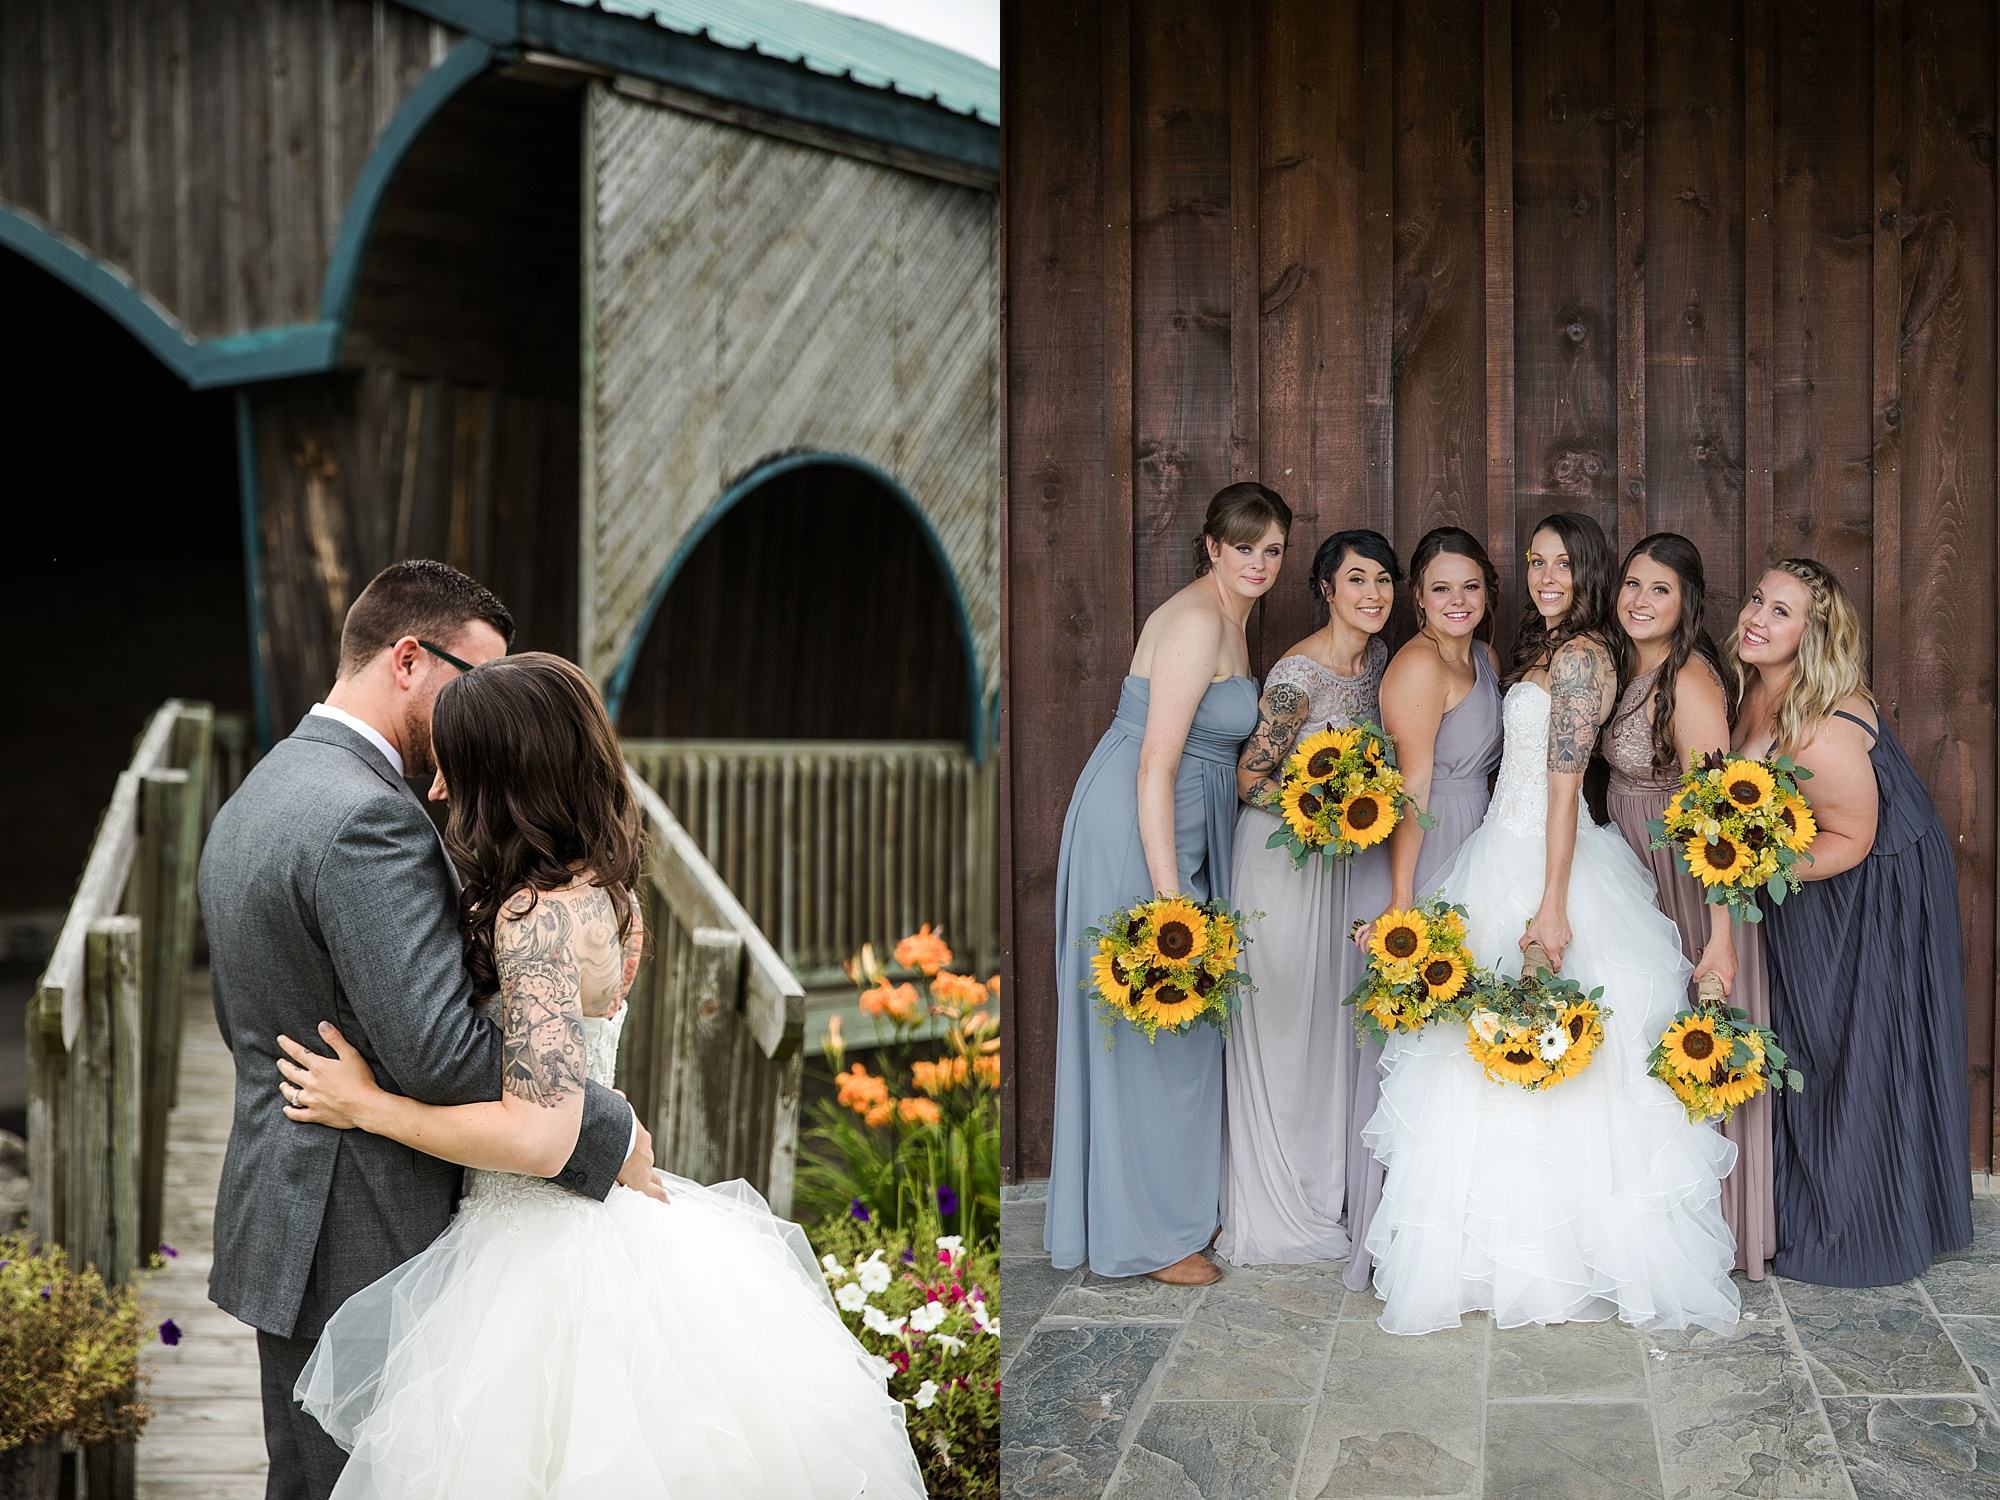 lipapark-hernderwinery-wedding_0024.jpg